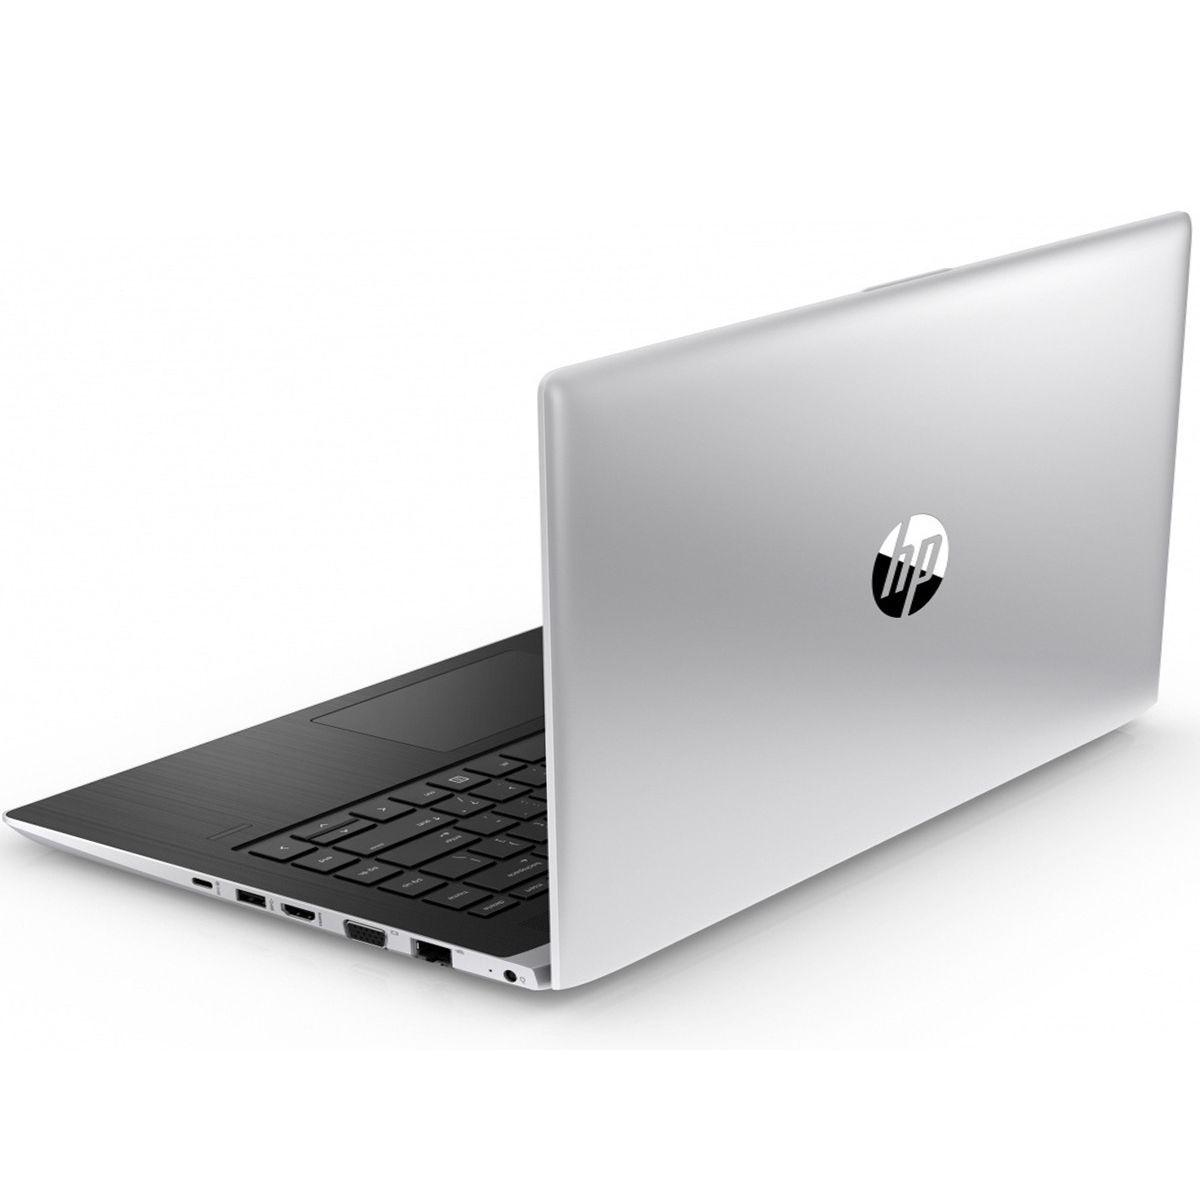 HP ProBook 440 G5 - 🥇 Portátiles Unilago Bogota 🥇 High Digital Range